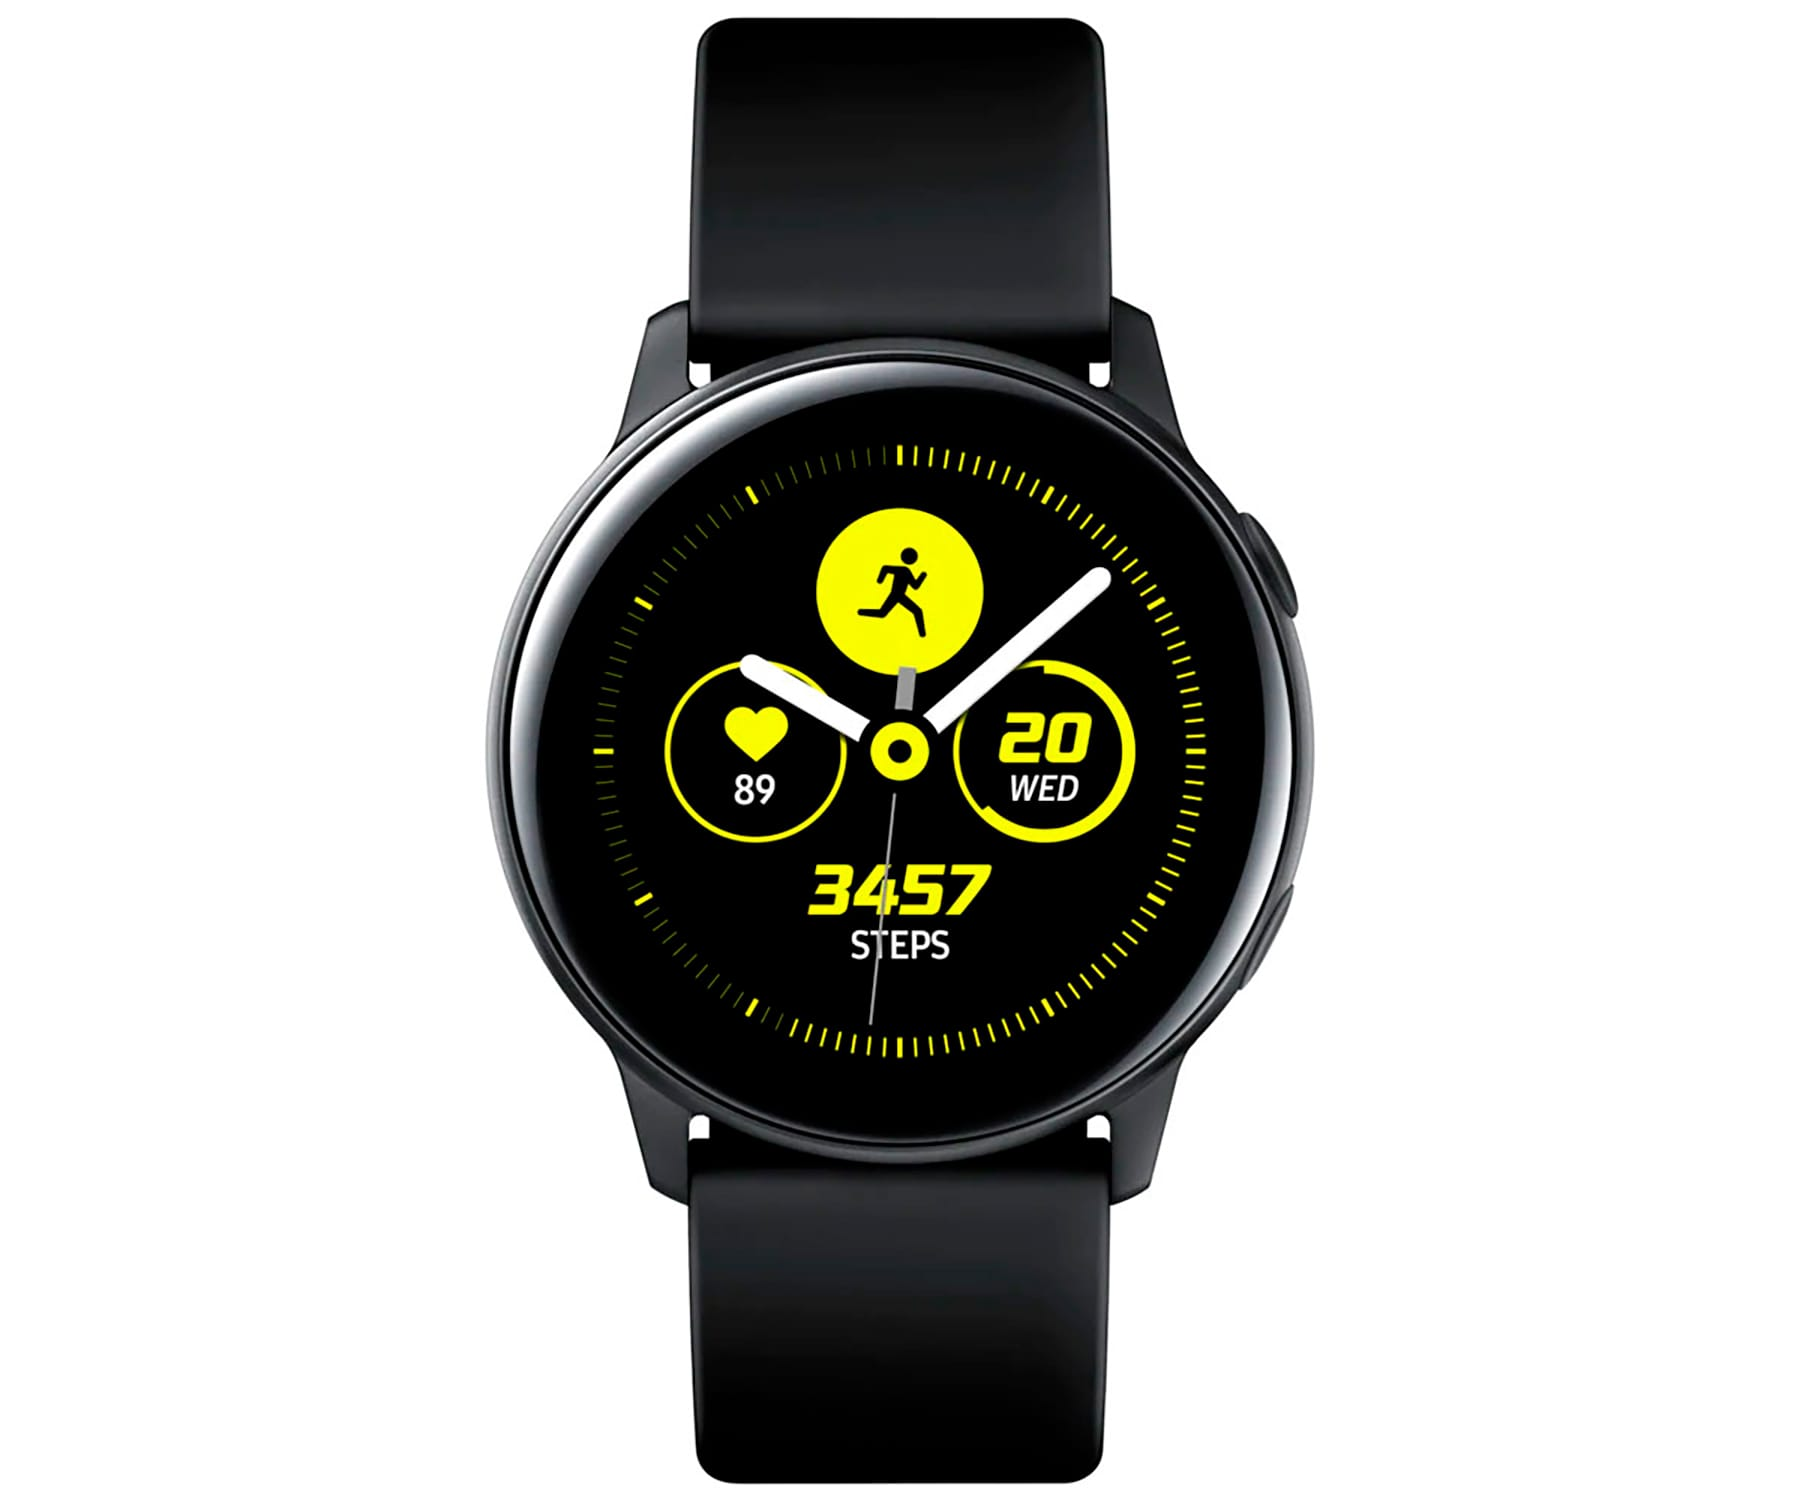 SAMSUNG GALAXY WATCH ACTIVE NEGRO SMARTWATCH 1.1'' AMOLED GPS BT